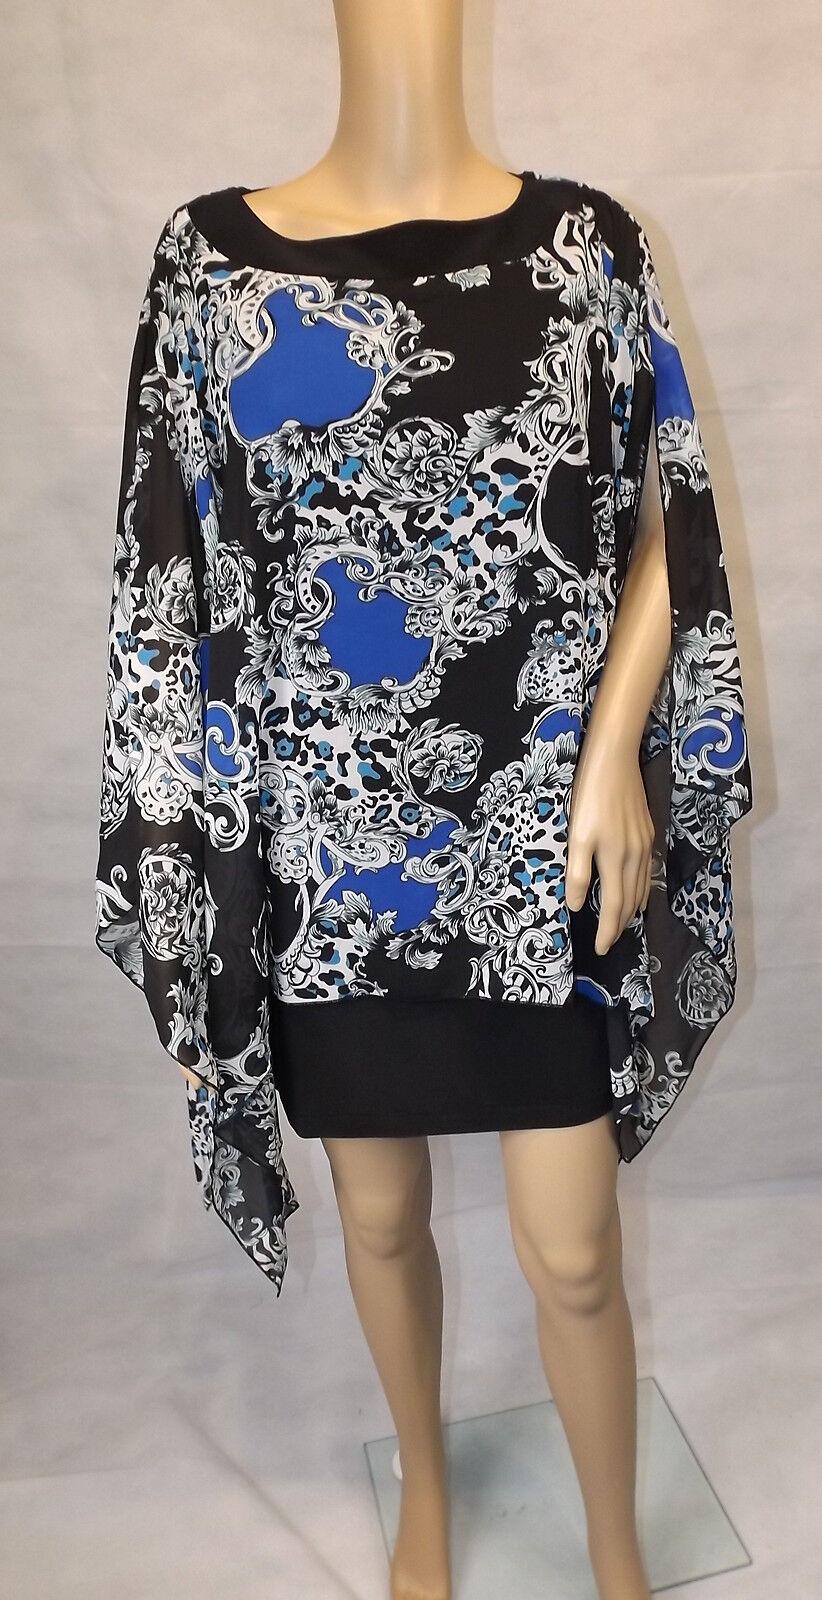 ALFrotO PAULY   34  Kleid mit Kaftan  Kaftankleid  schwarz blau  mini  NEU